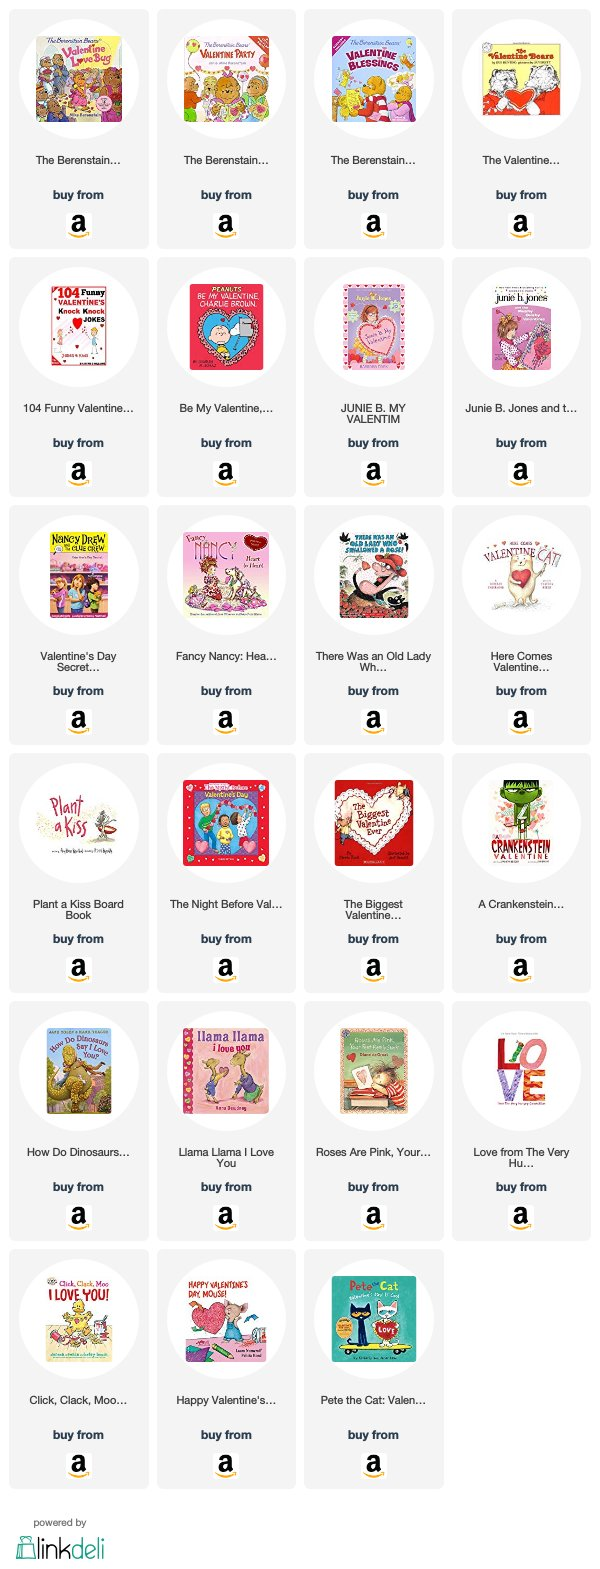 12 Children's Books about Love